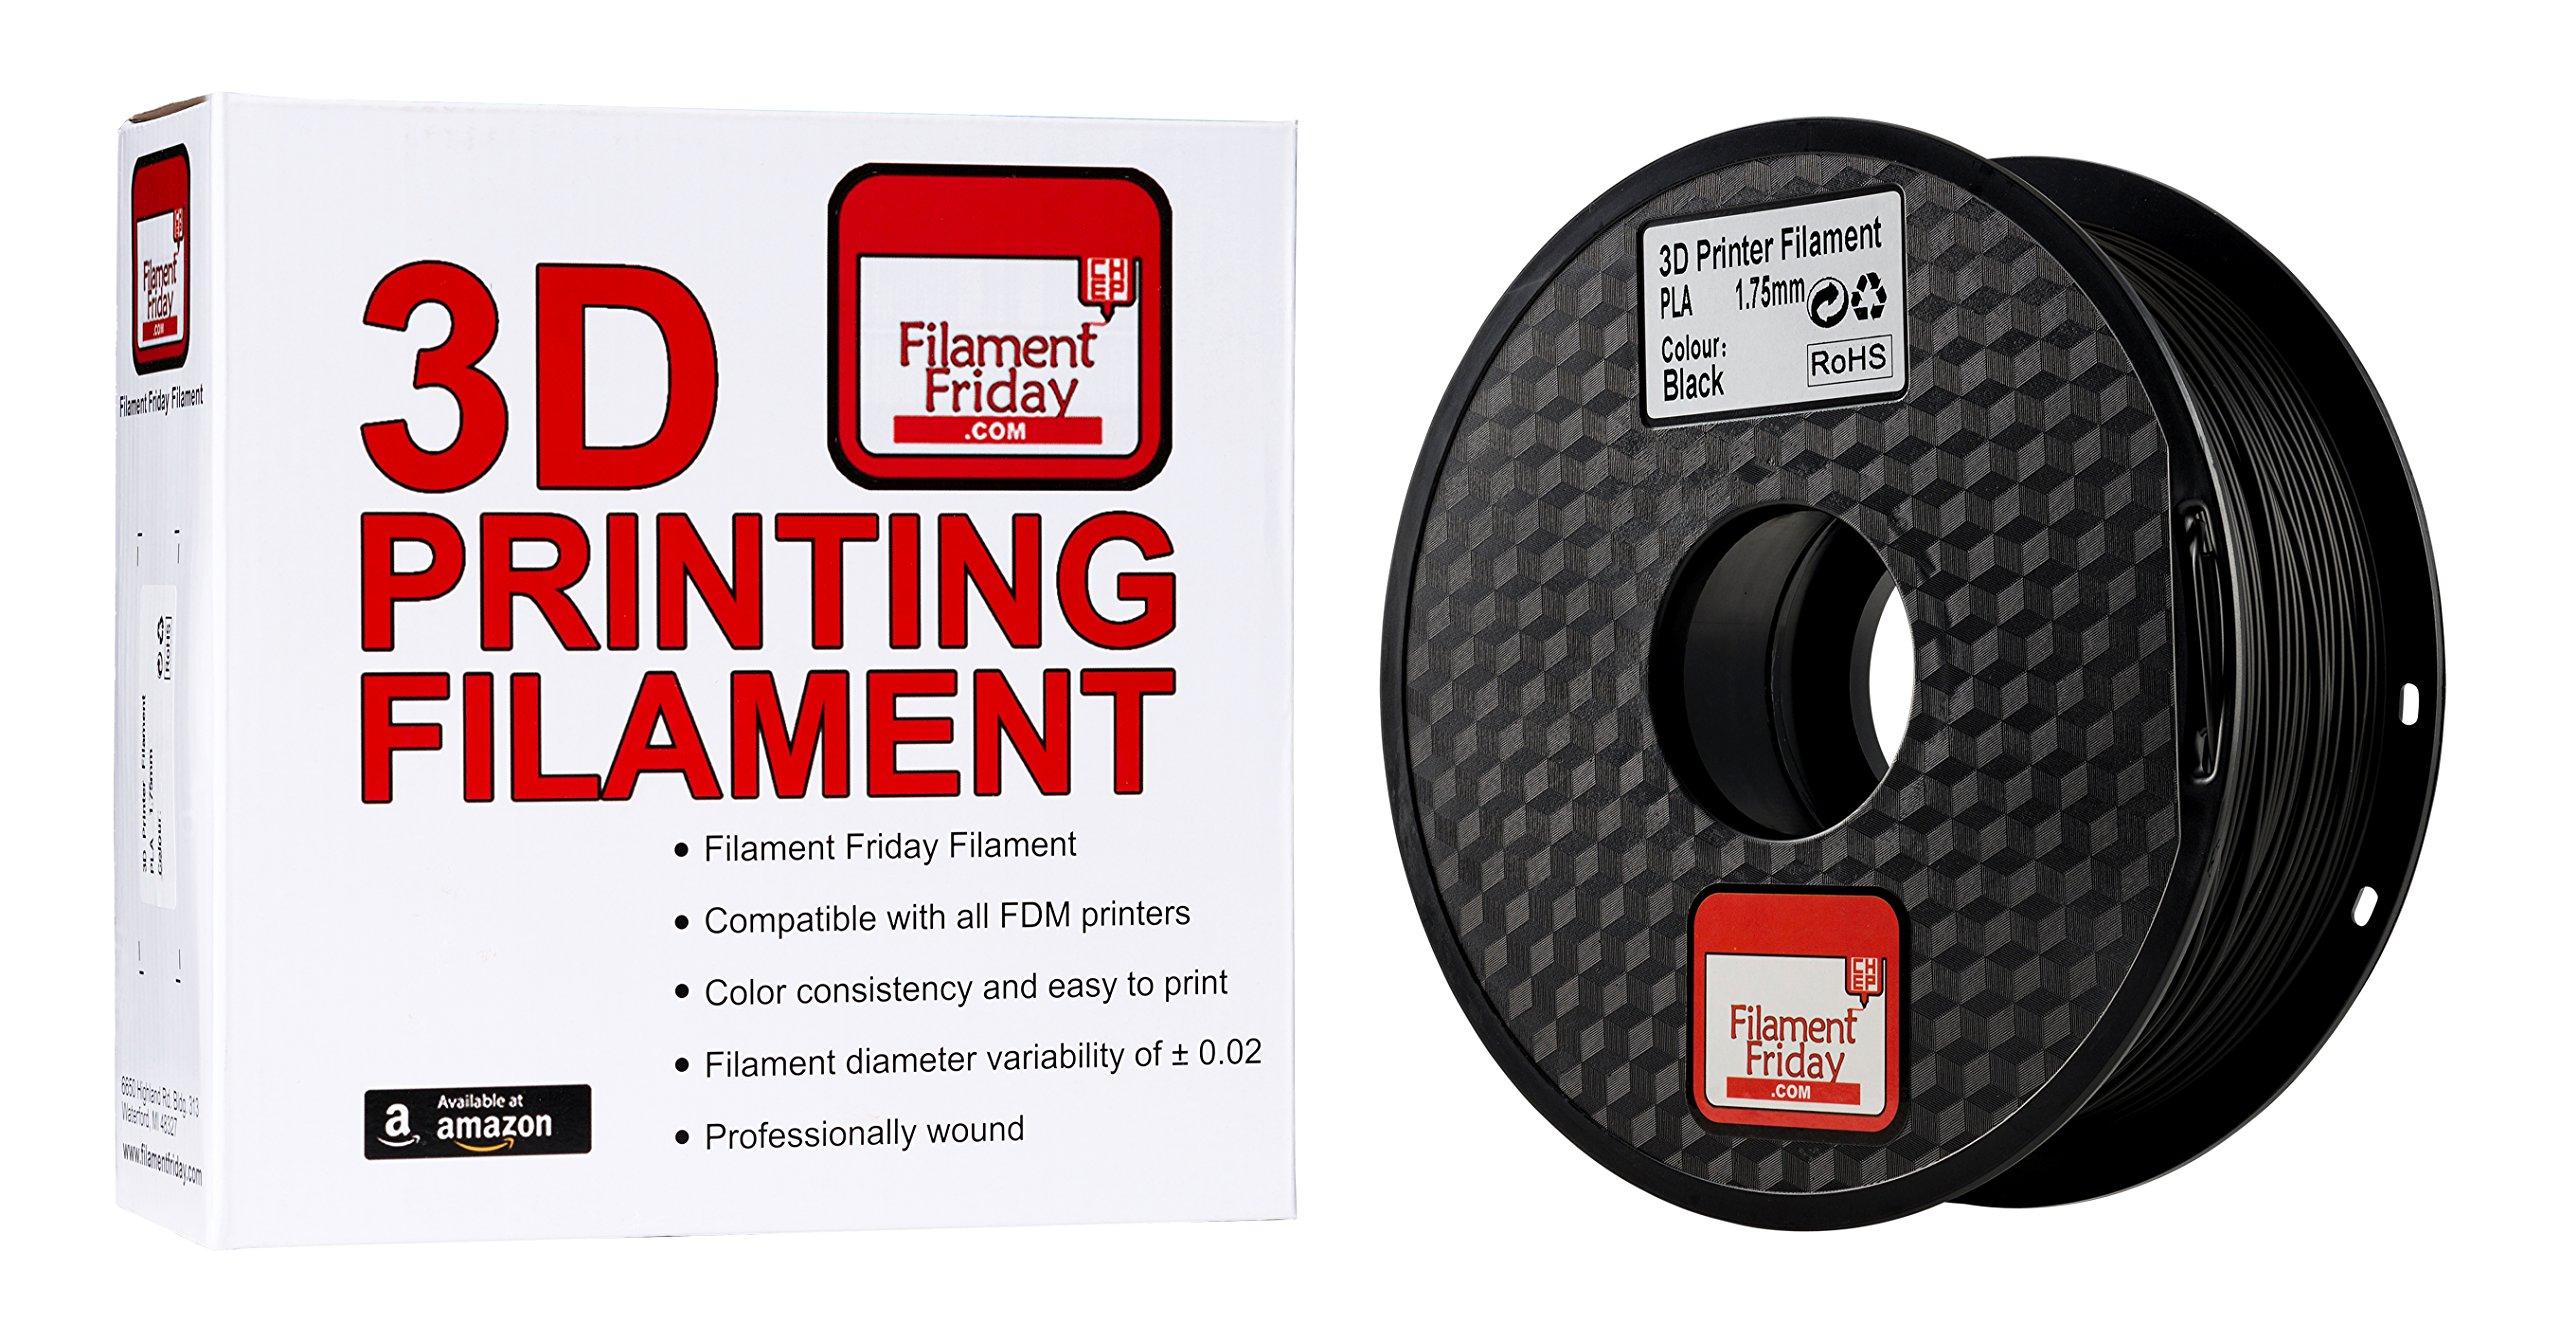 PLA Filament for 3D Printer - Black 3D Printer PLA Filament with Dimensional Accuracy +/- 0.02 mm - 1.75mm Diameter - 1KG Spool - Official Filament Friday Filament